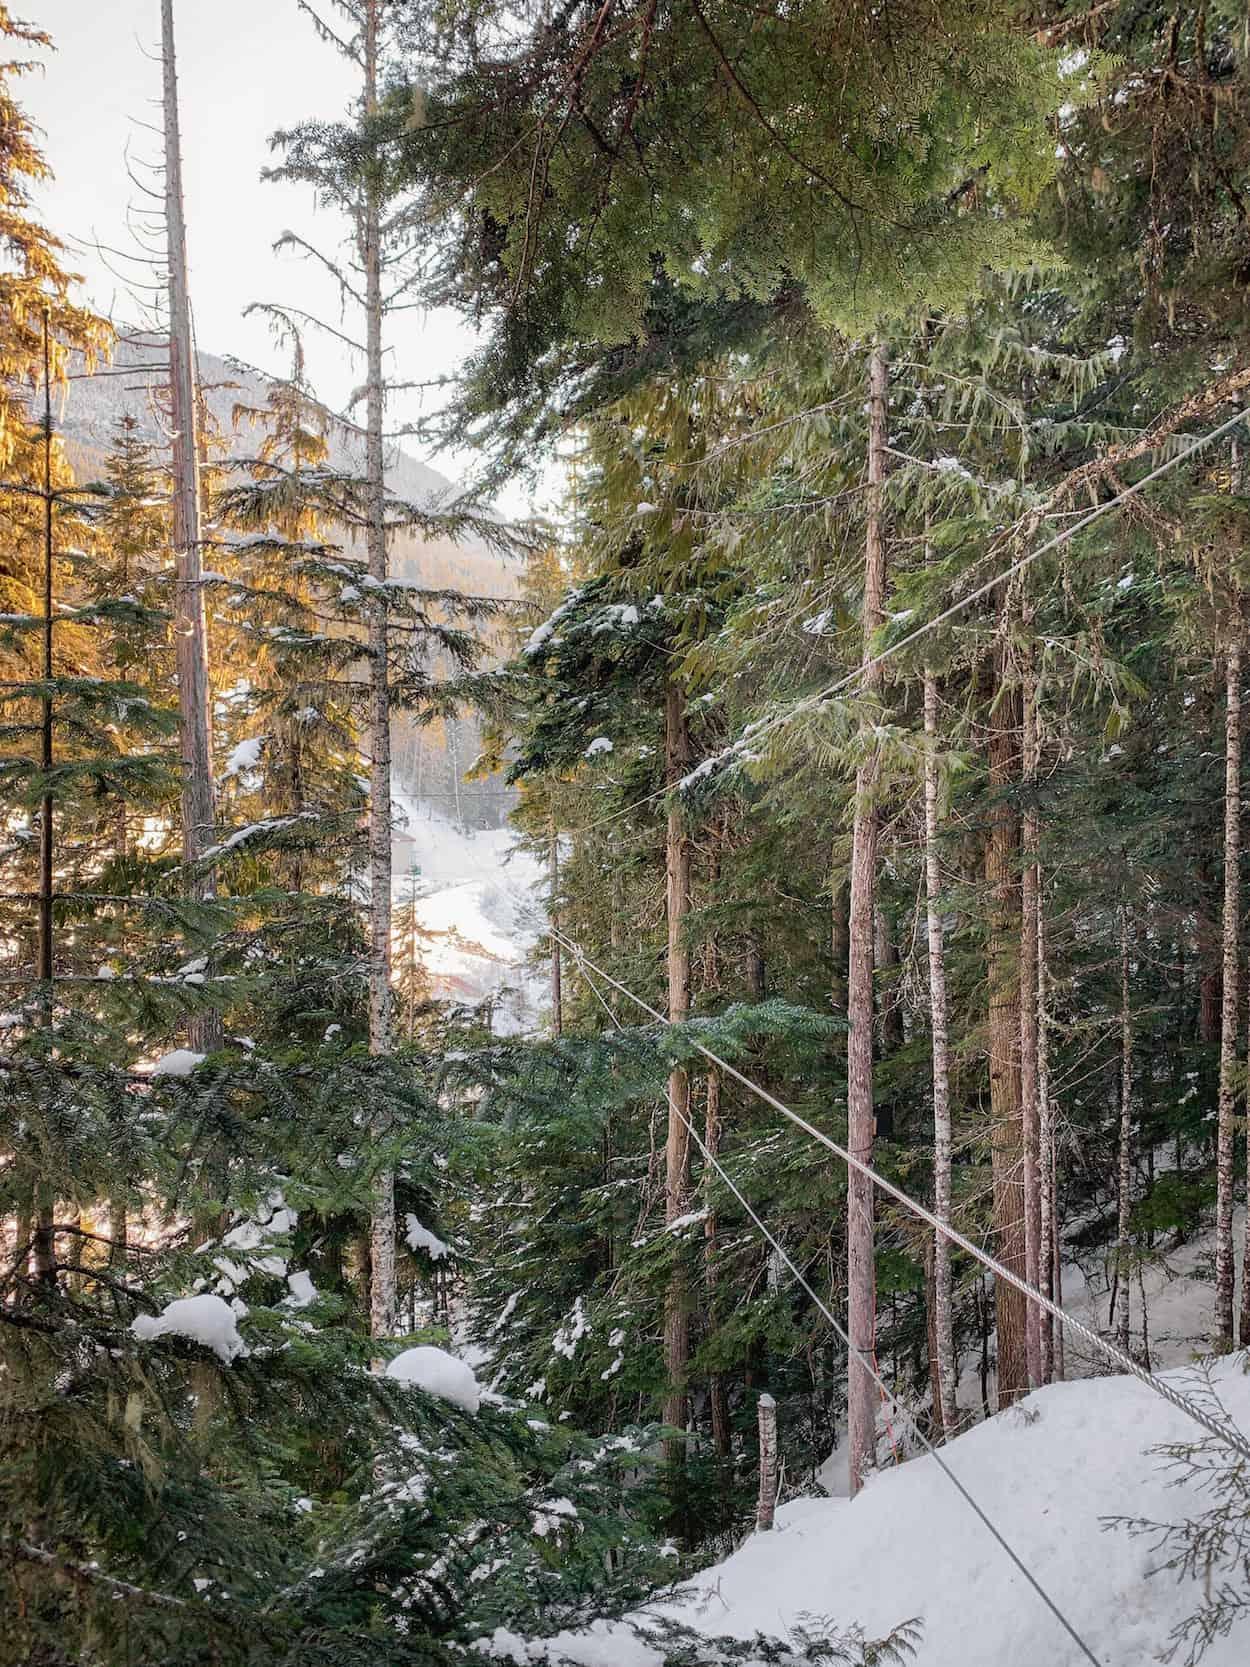 Ziplining the Eagle tour with Ziptrek Ecotours in Whistler, British Columbia